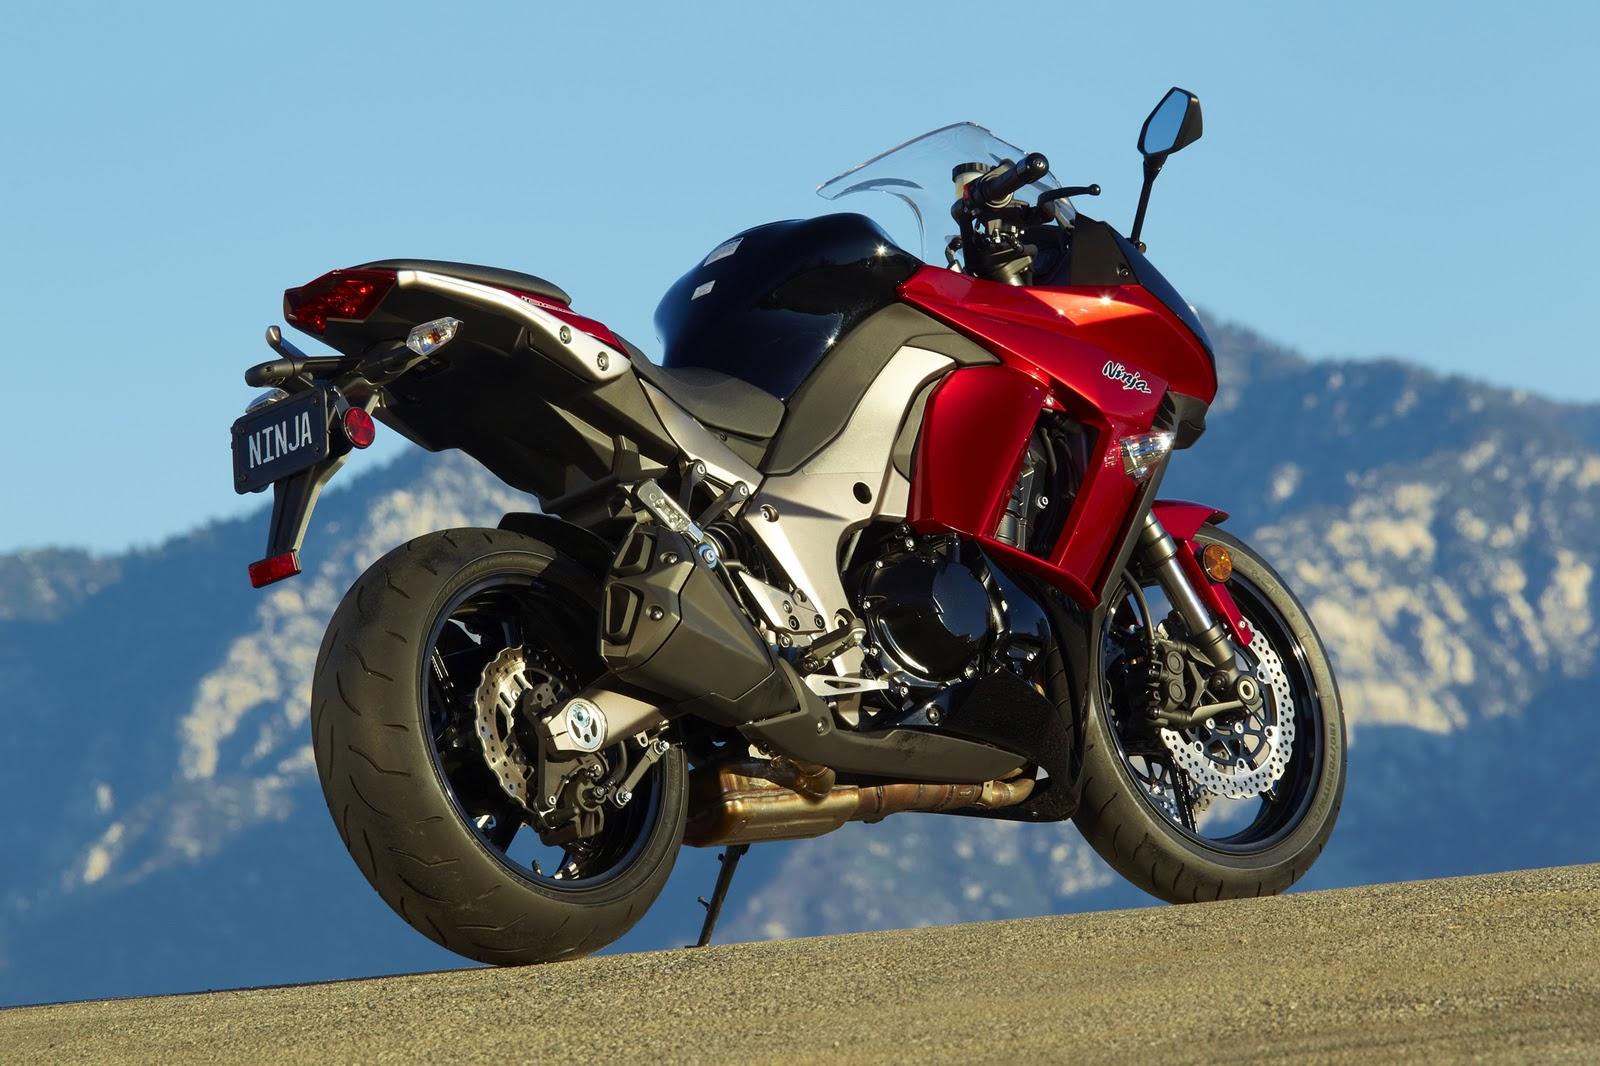 2011 Kawasaki Ninja 1000 a new Sportbike Leader   Motor Sport Gallery